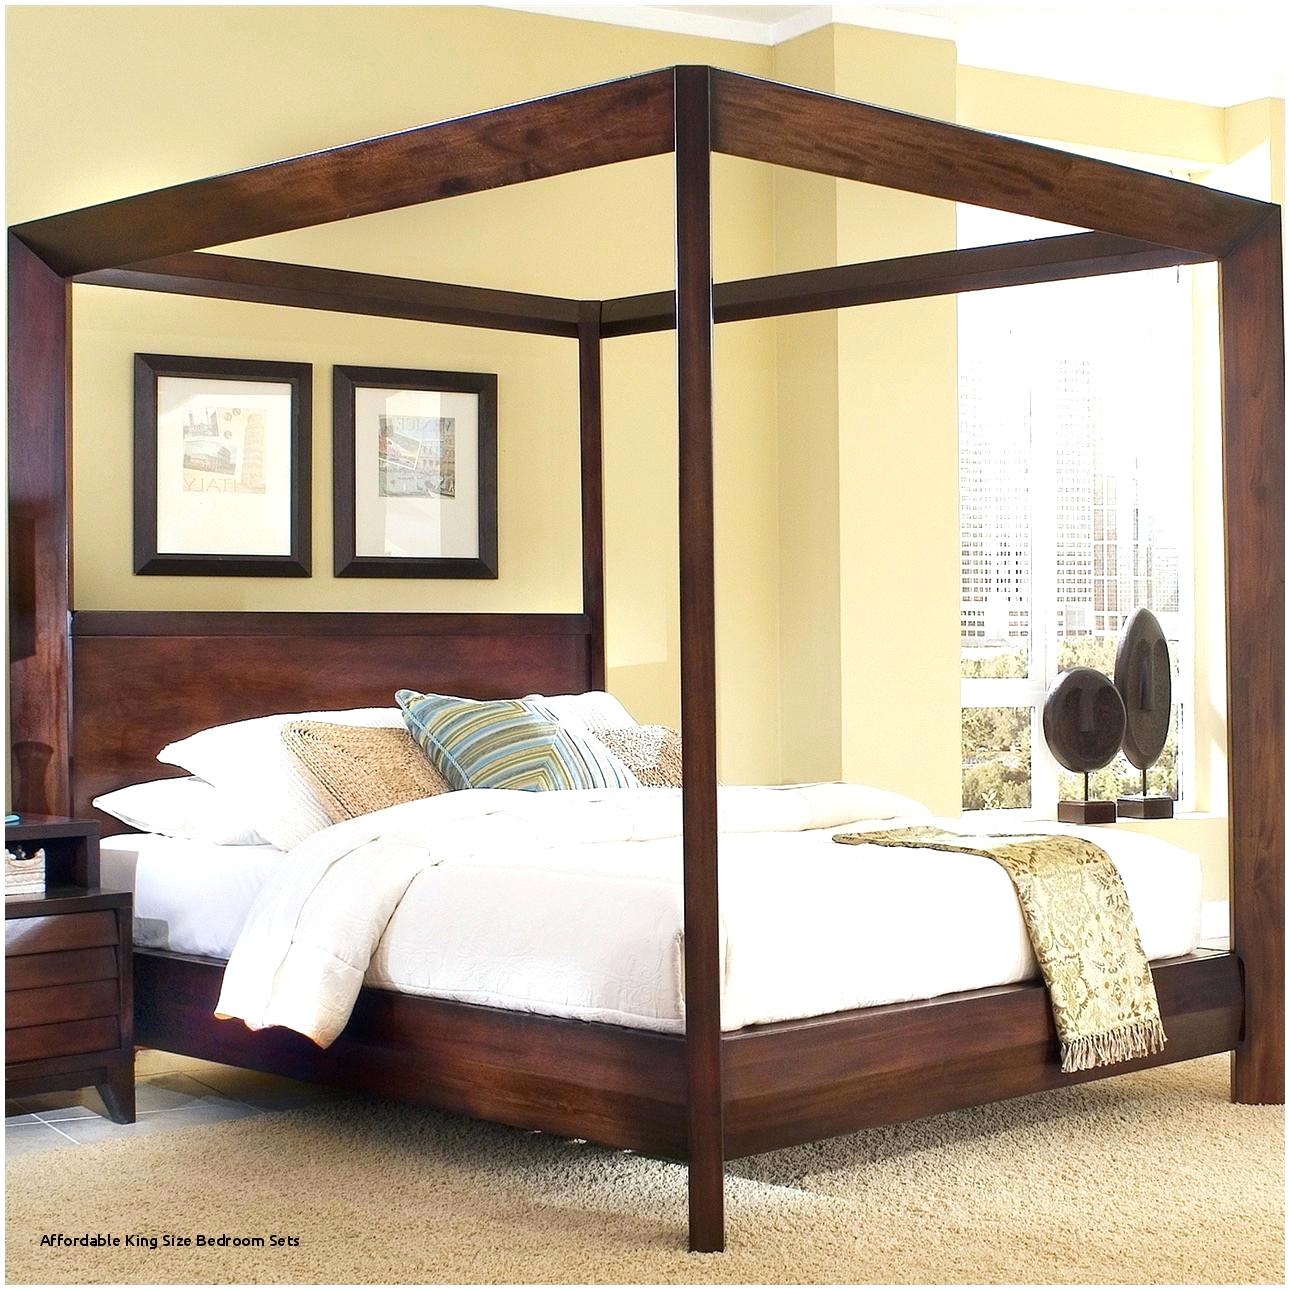 Cheap Full Size Bedroom Sets Beautiful Bedroom Design 0d Archives Best Affordable King Size Bedroom Sets